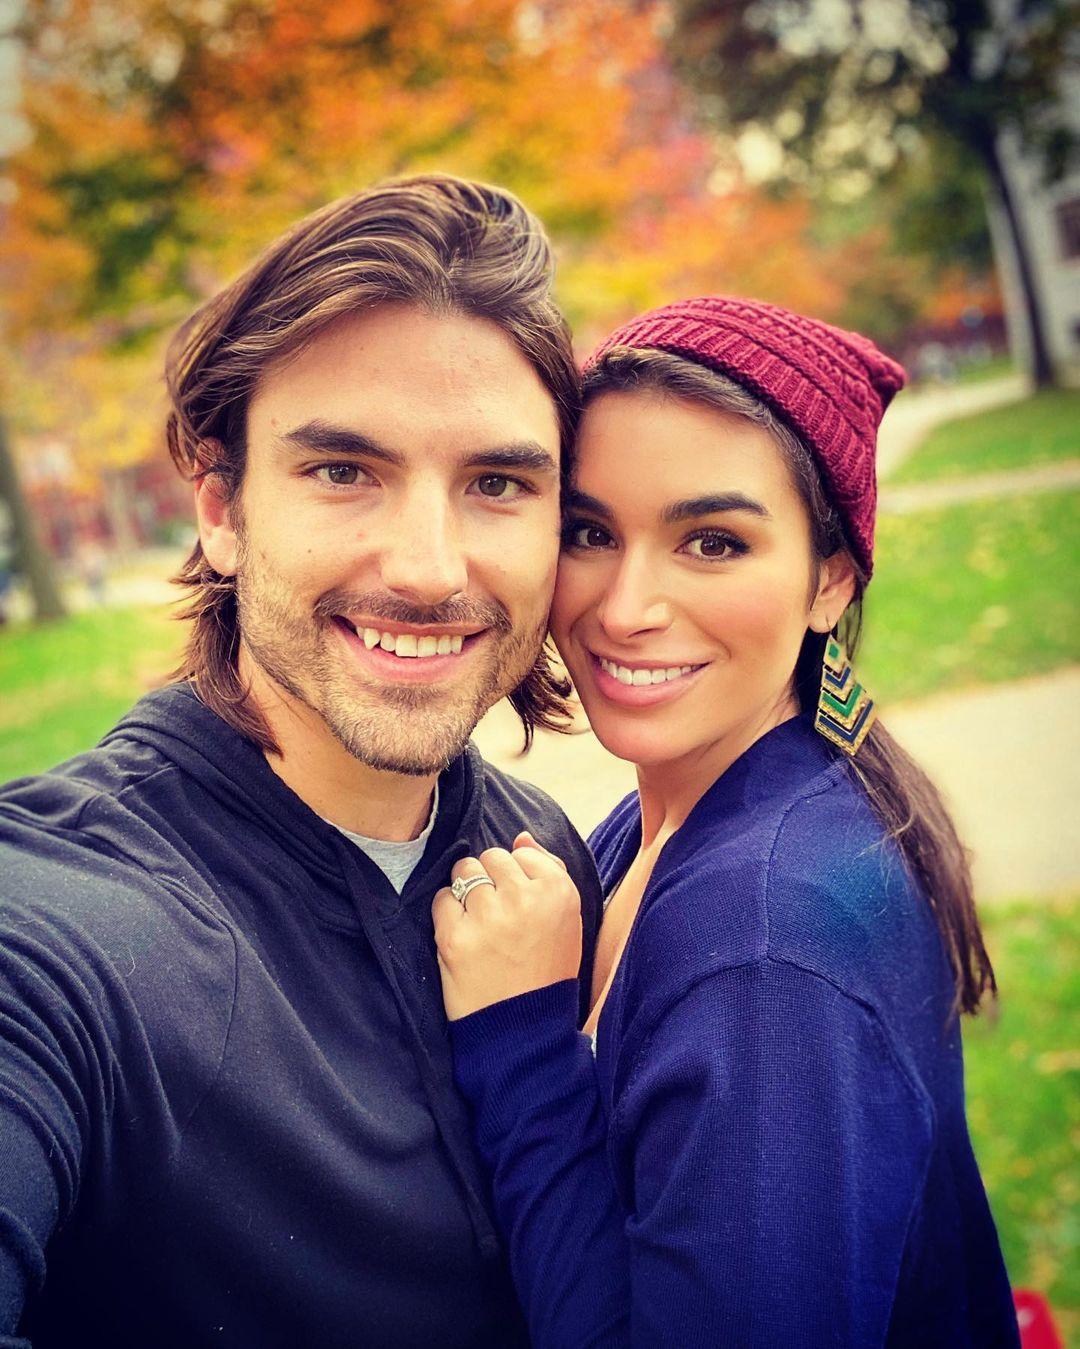 'Bachelor' Alum Ashley Iaconetti Is Pregnant! Expecting Baby No. 1 With Husband Jared Haibon